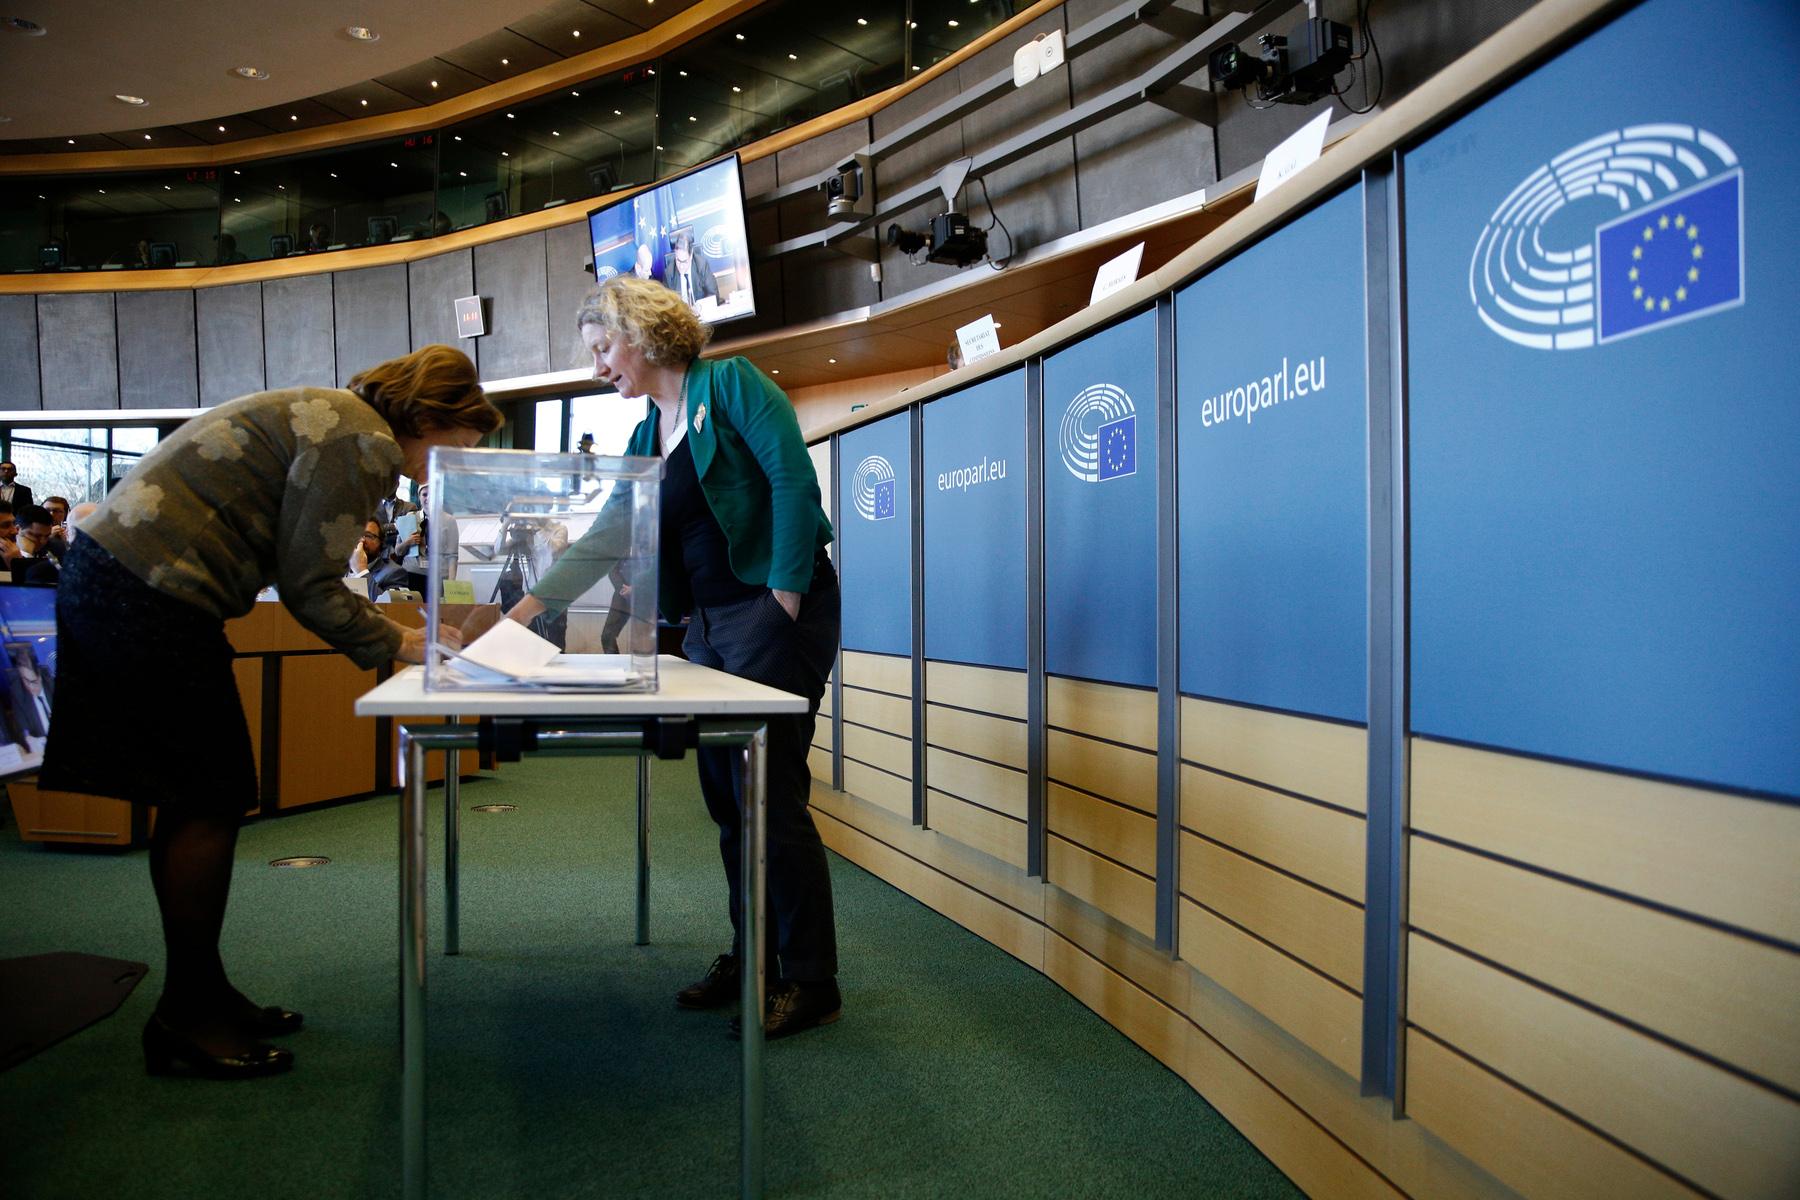 European Parliament ballot casting